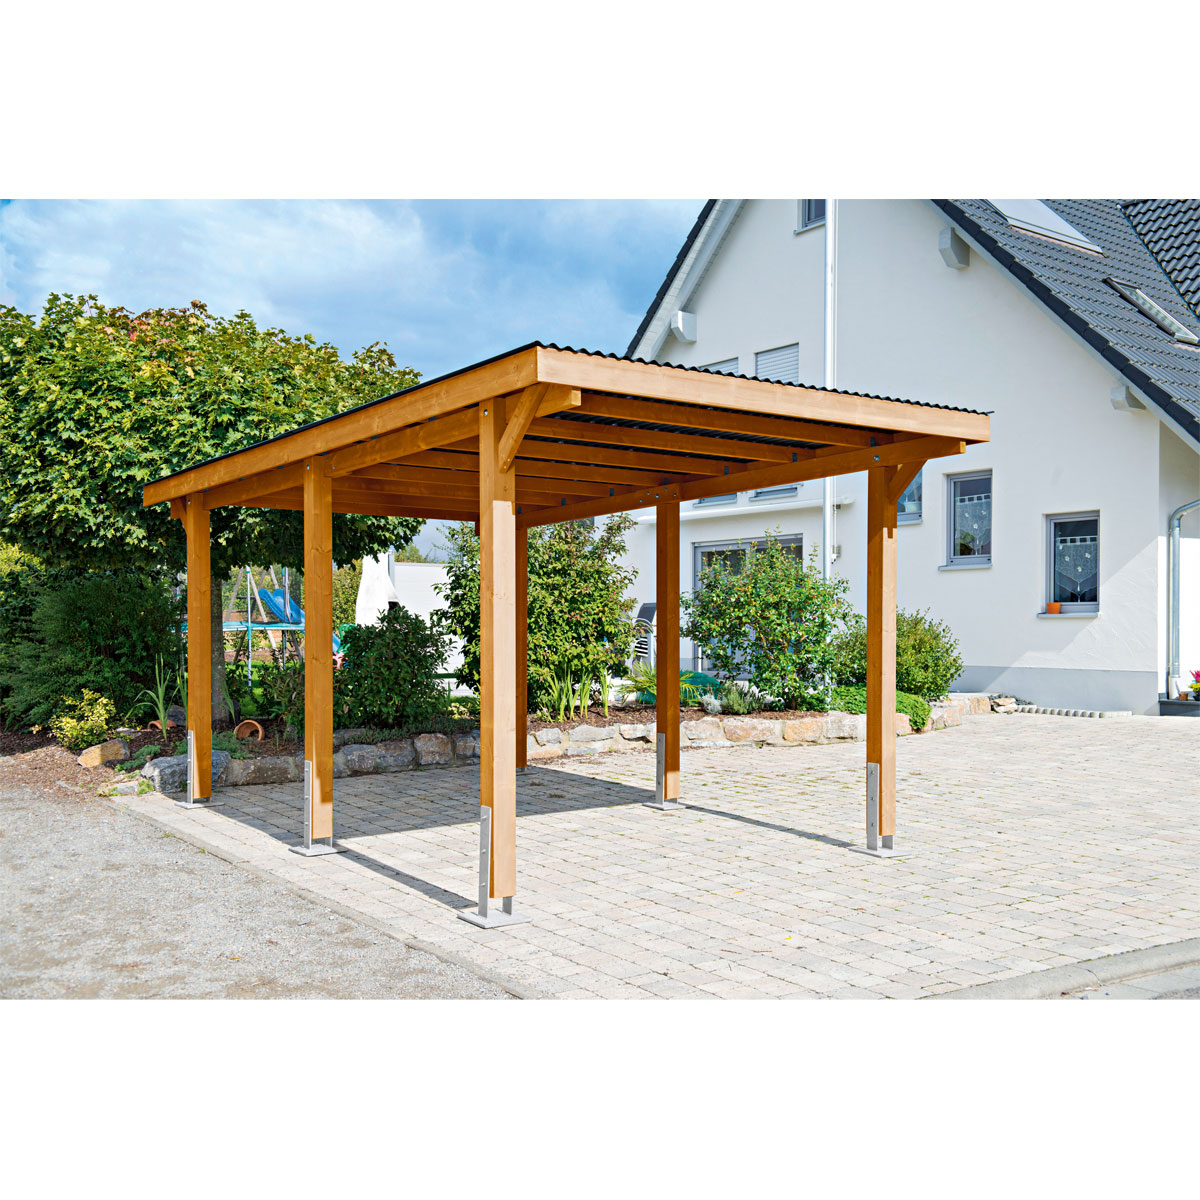 "Carports - Carport ""Dortmund"", 301x504 cm, Kiefer kdi PVC  - Onlineshop Hellweg"